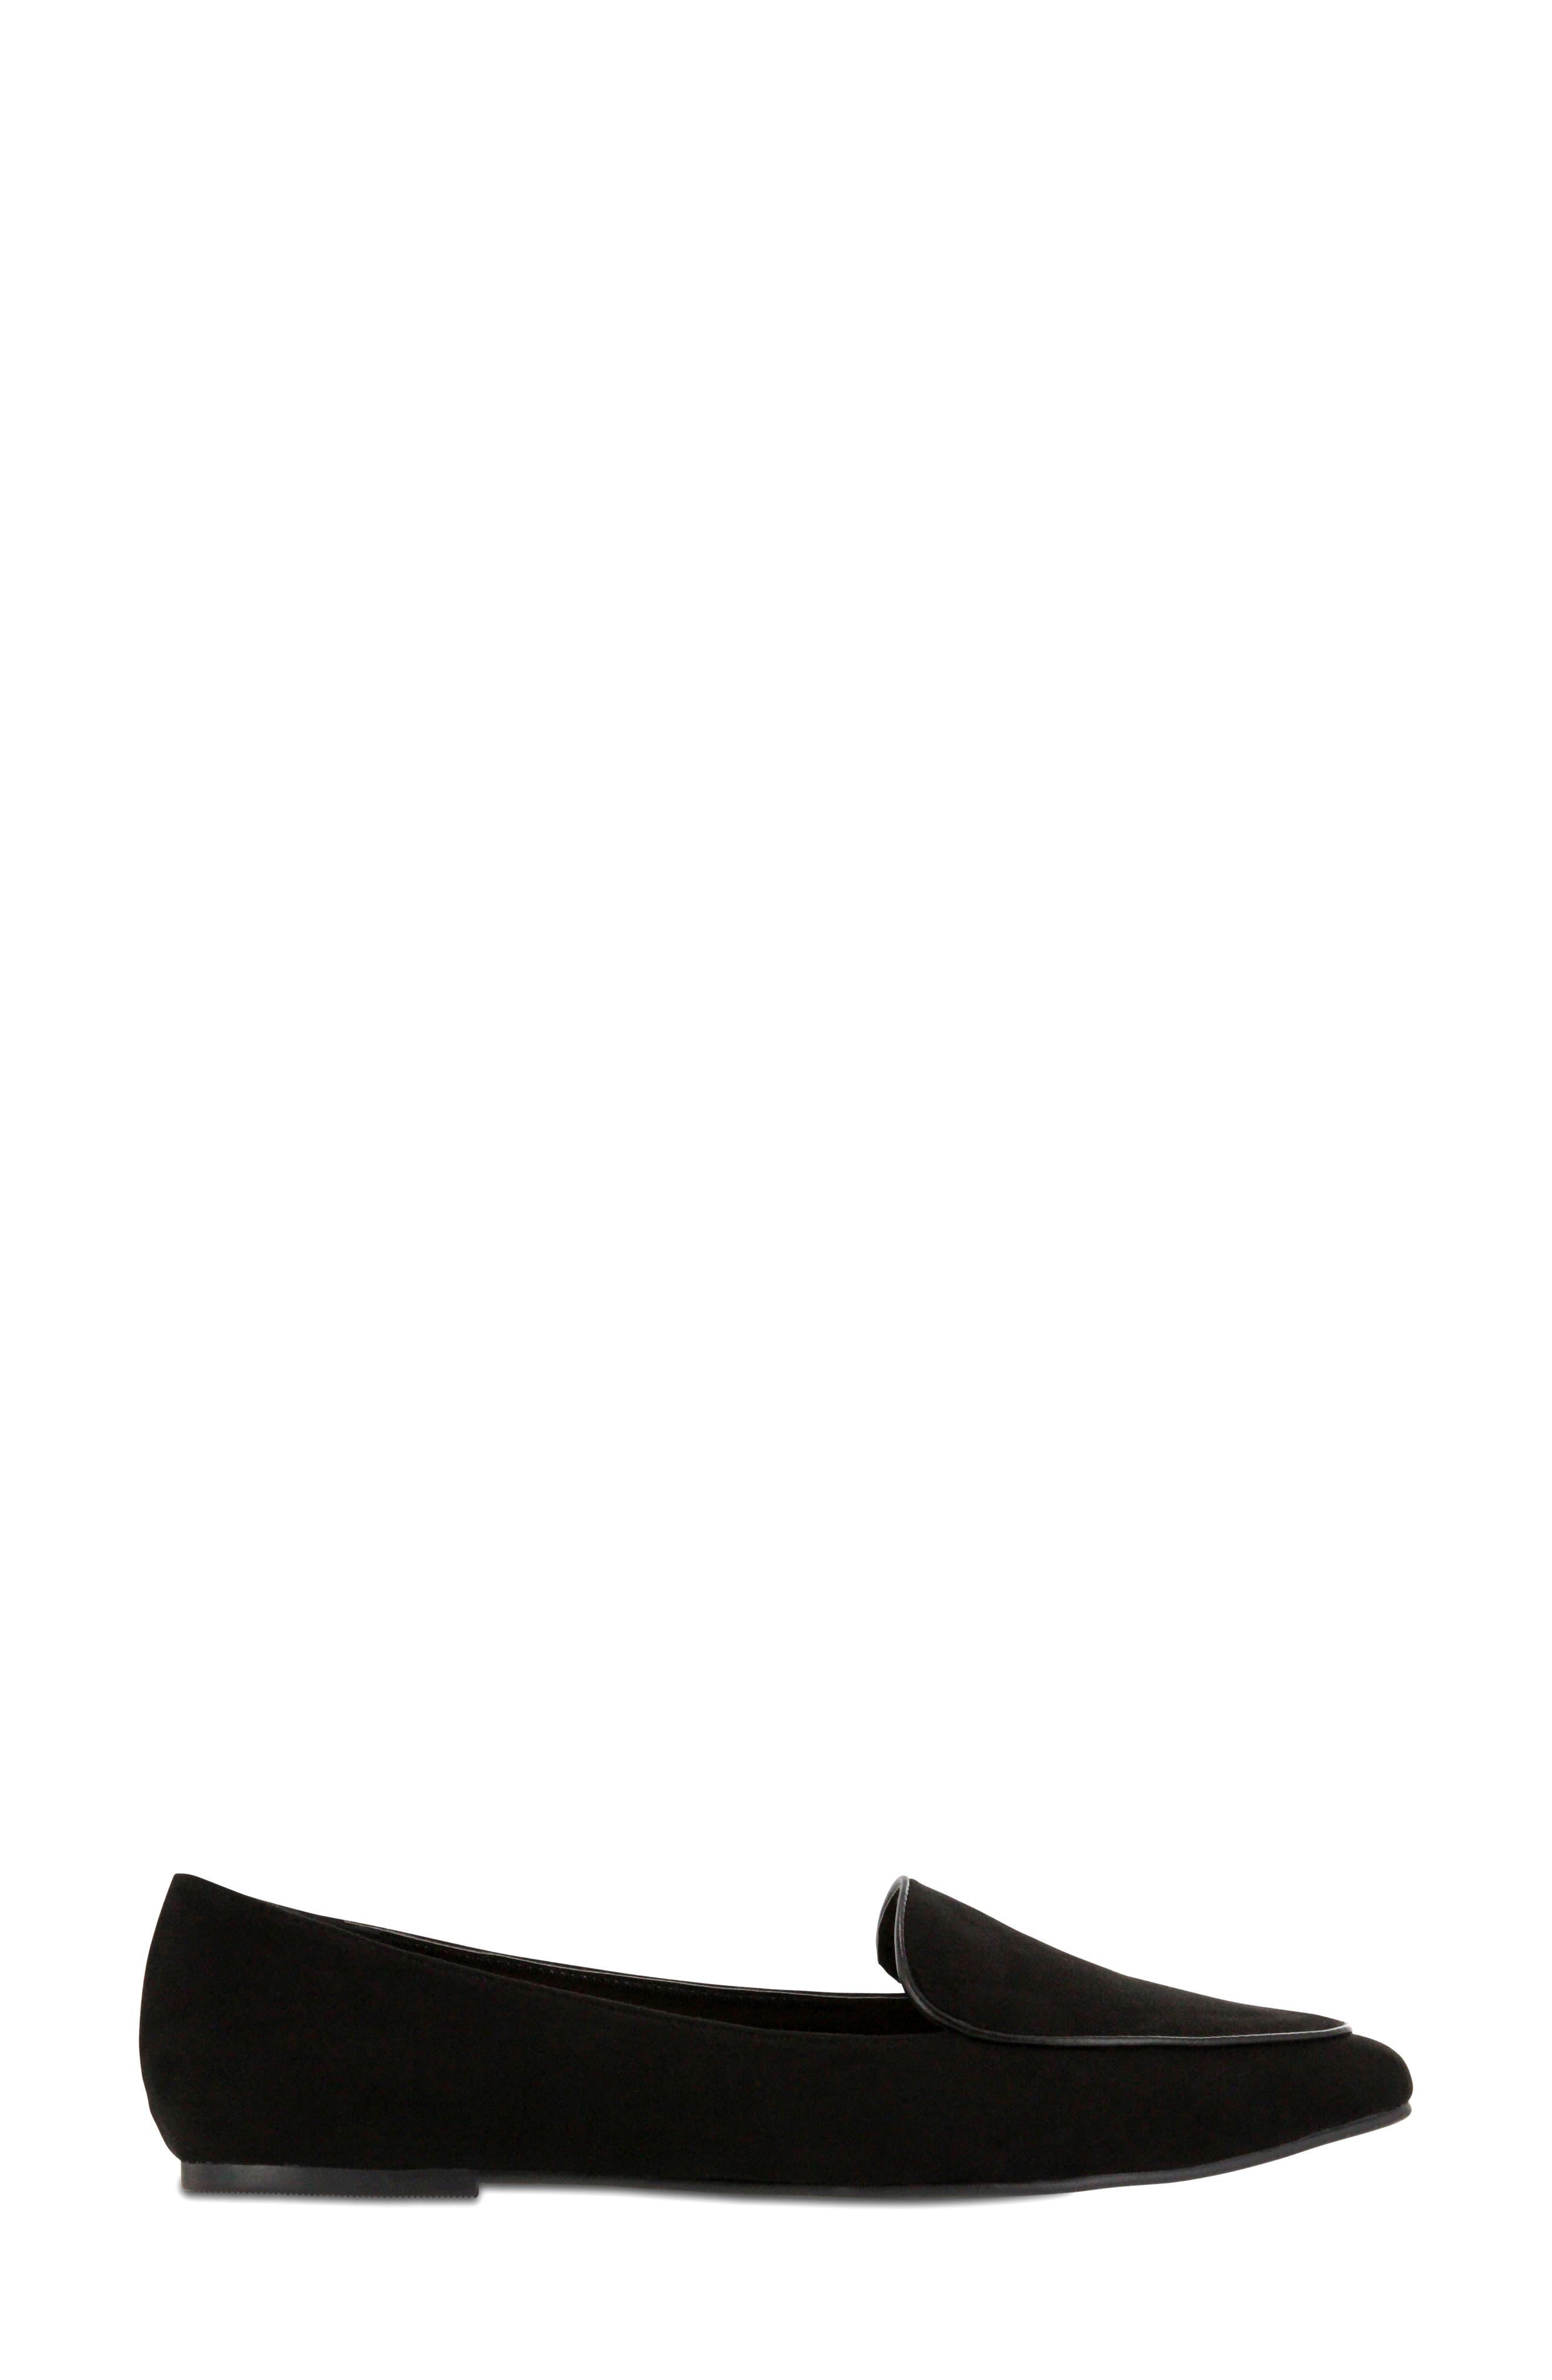 Niles Loafer,                             Alternate thumbnail 3, color,                             Black